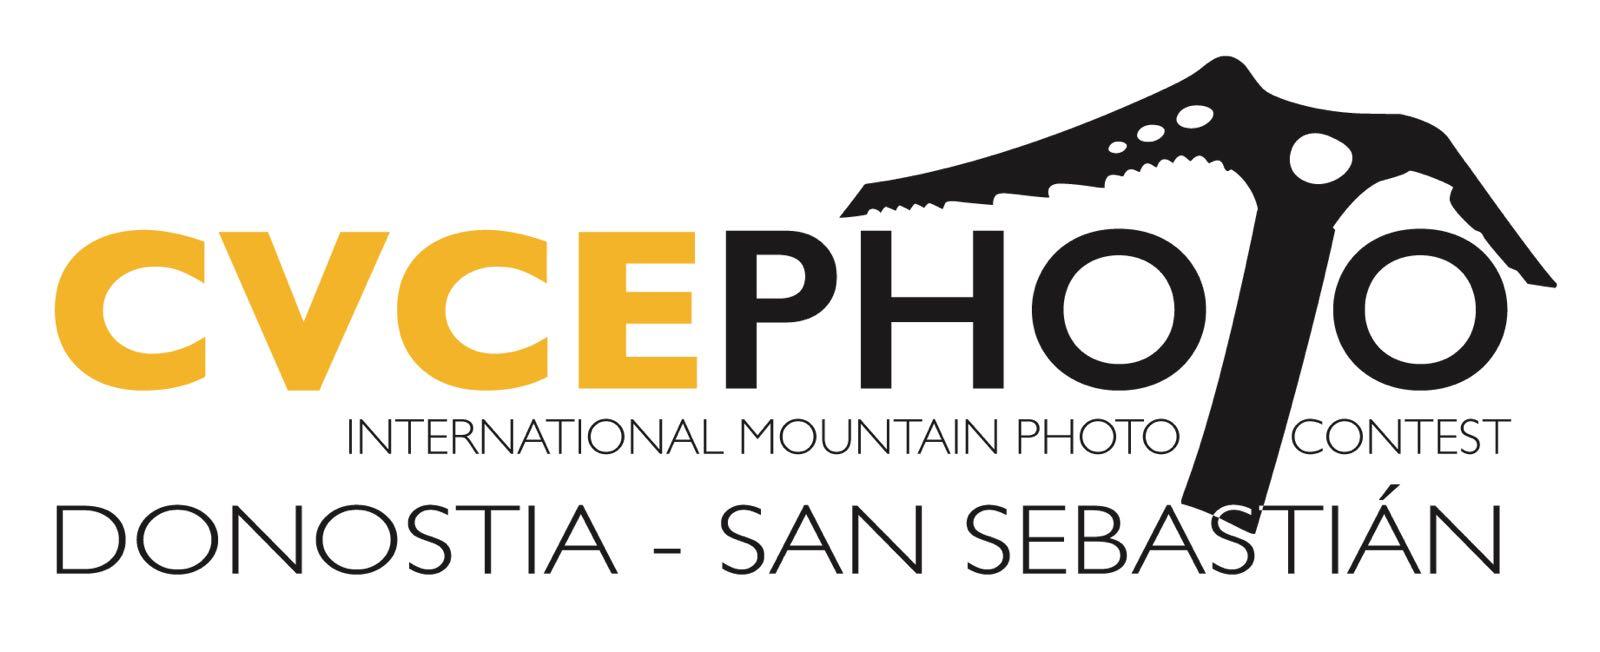 CVCEPhoto International Mountain Photography Contest 2019